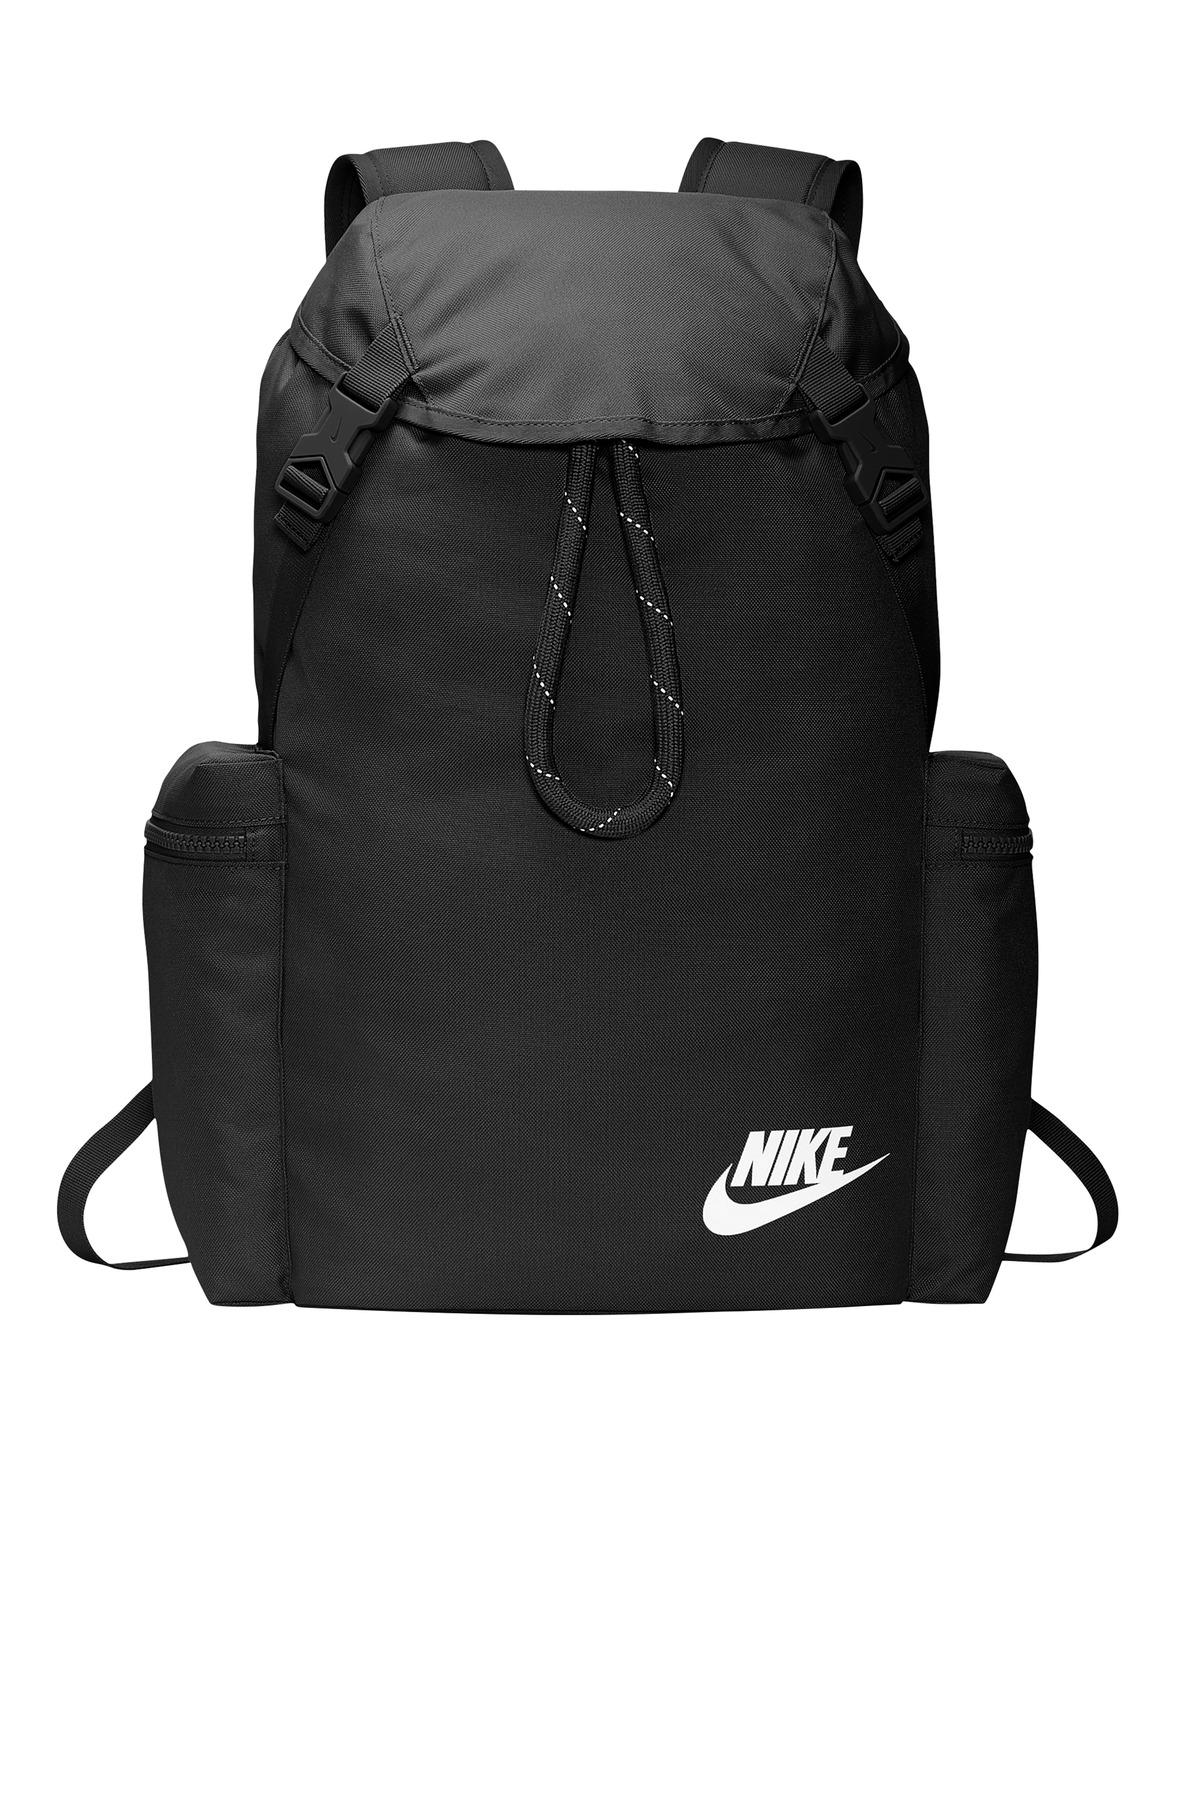 BA black flat bag front